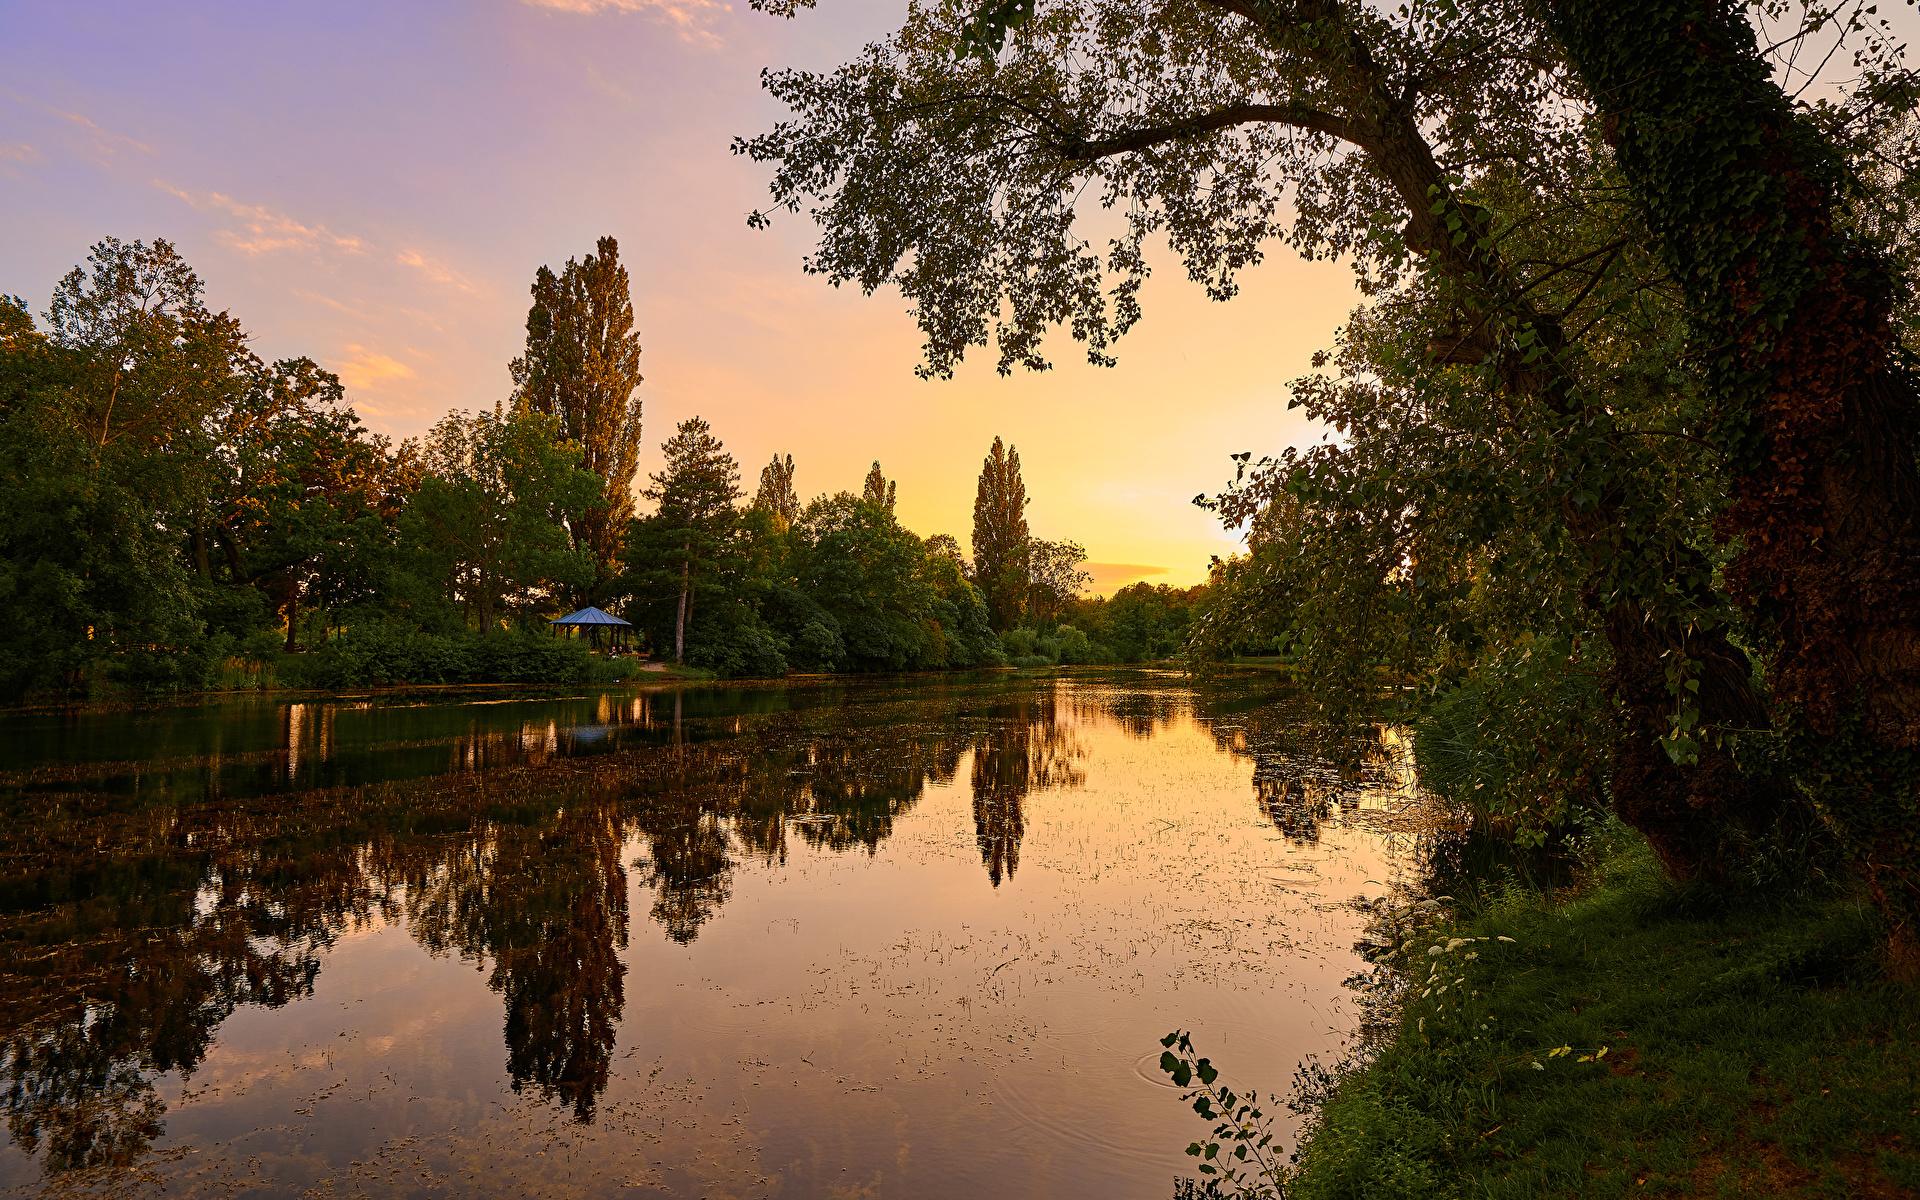 Картинка Вена Австрия Wasserpark Floridsdorf Природа Парки рассвет и закат река дерево 1920x1200 парк Рассветы и закаты Реки речка дерева Деревья деревьев